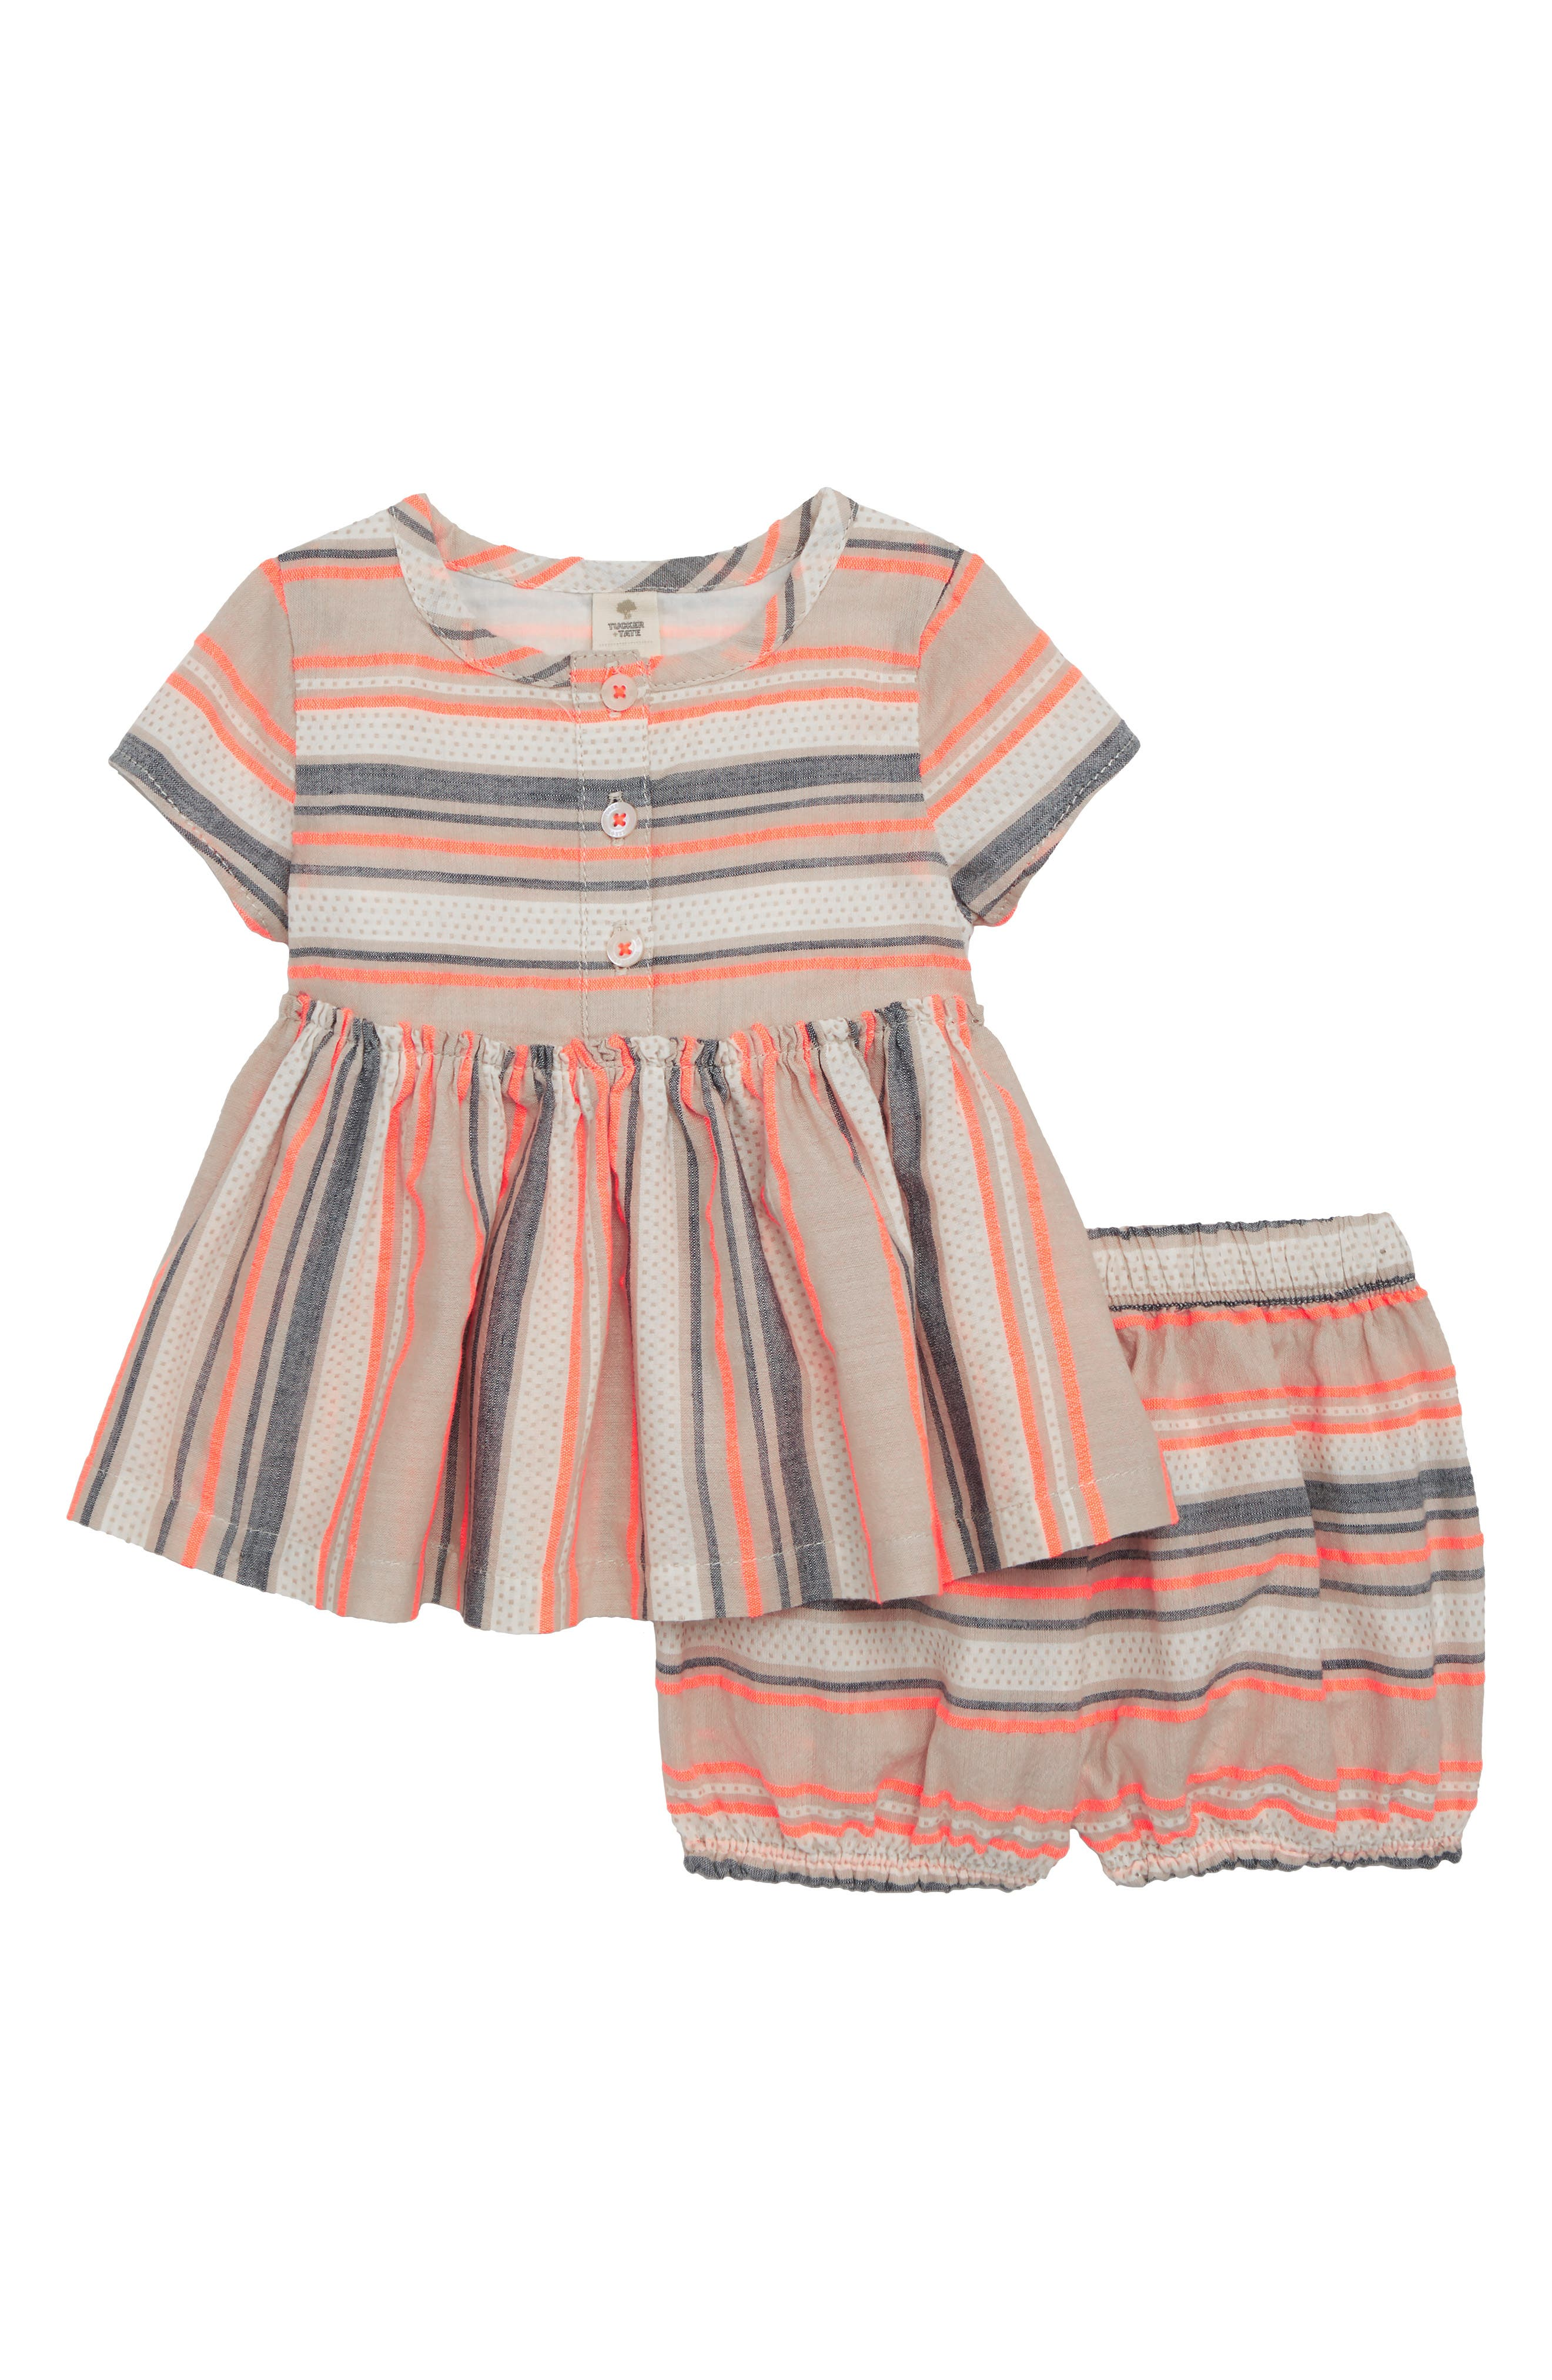 Woven Stripe Swing Top & Bubble Shorts Set,                             Main thumbnail 1, color,                             Pink Cloud Multi Stripe